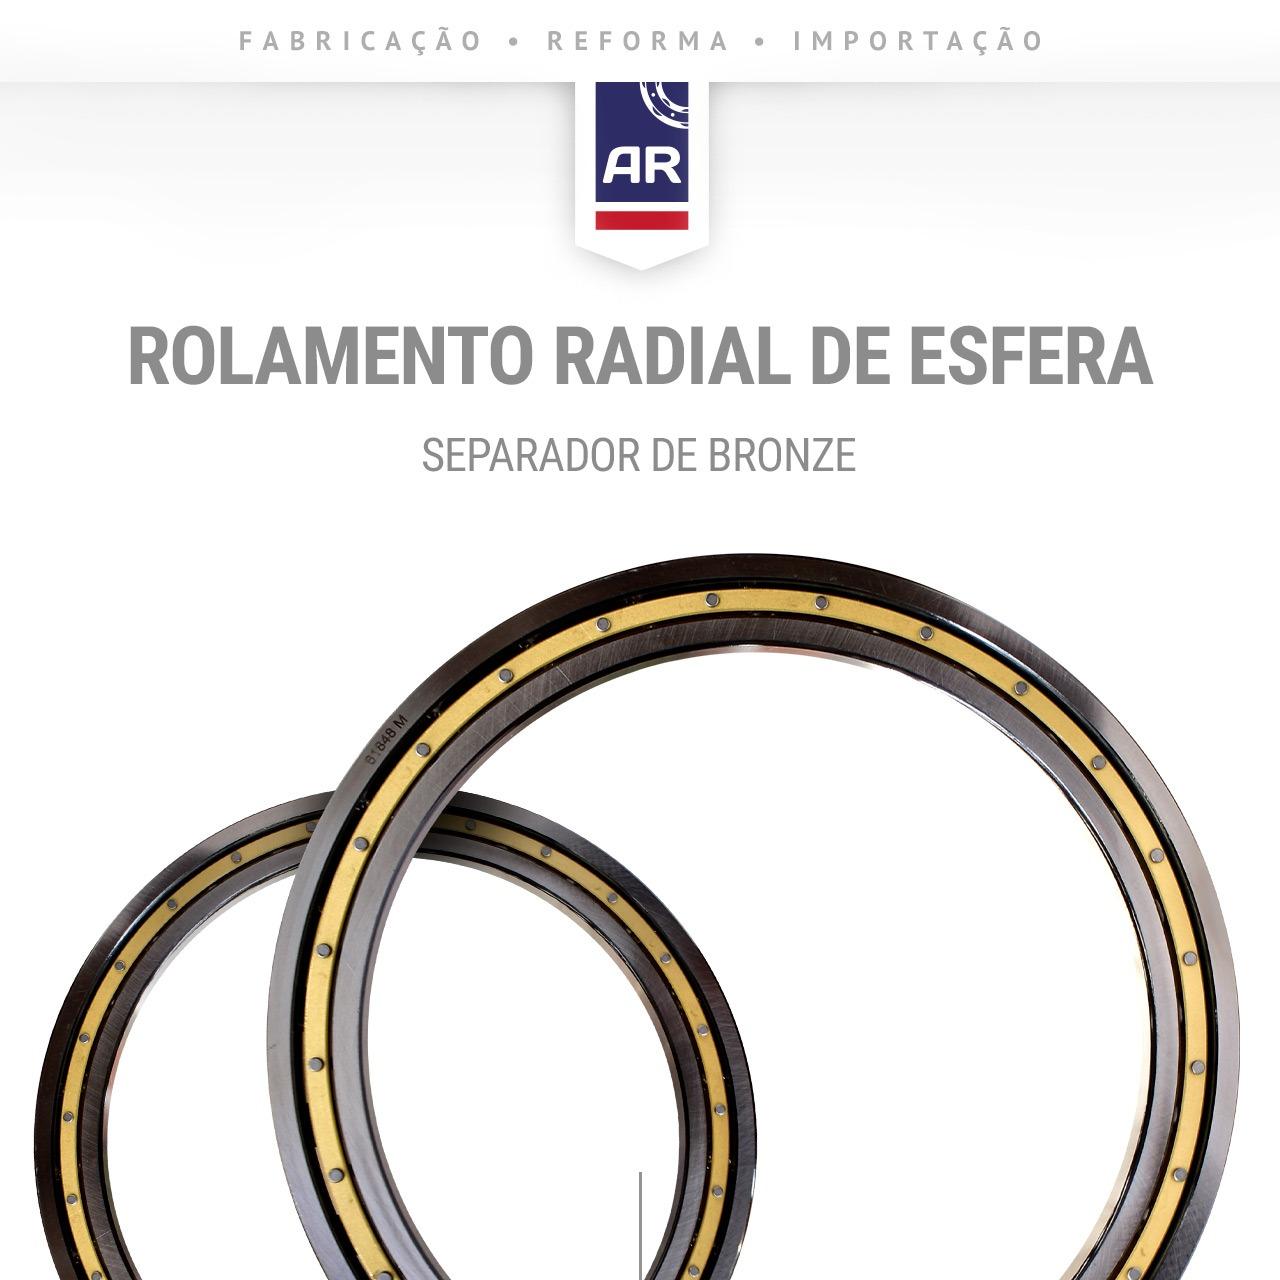 rolamento-radial-esfera-separador-bronze